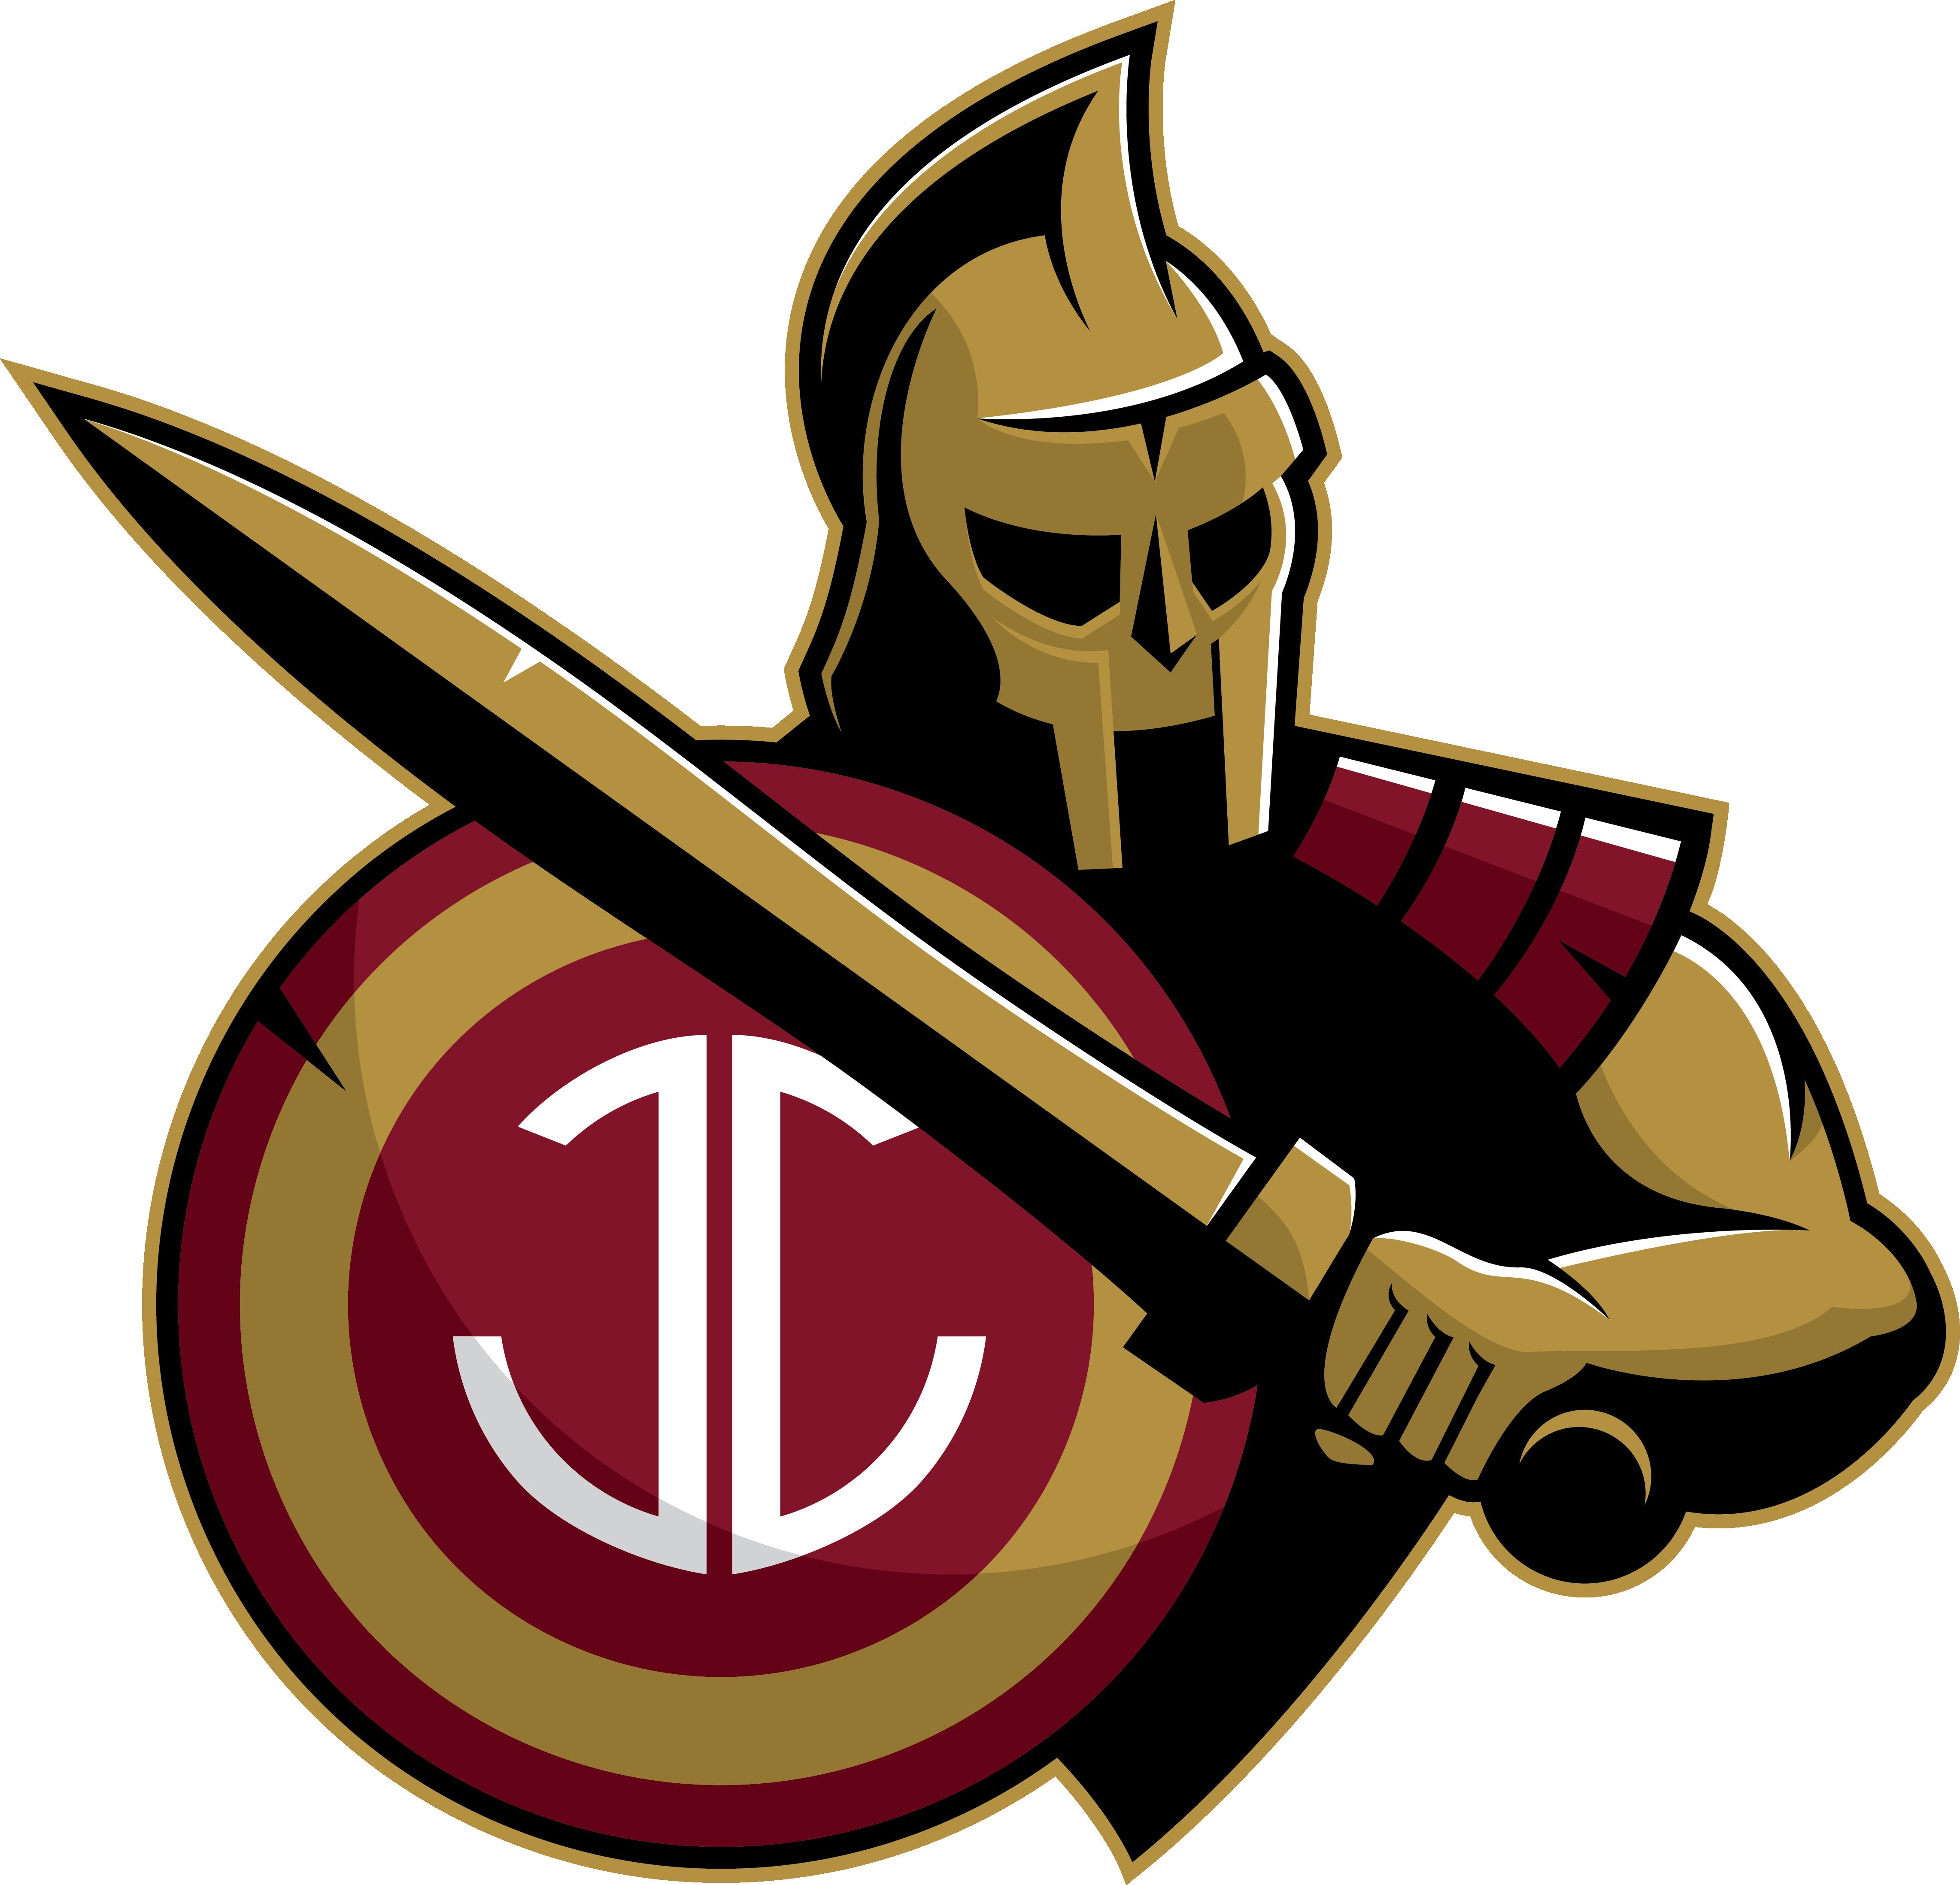 Gladiator Cheer Program Information